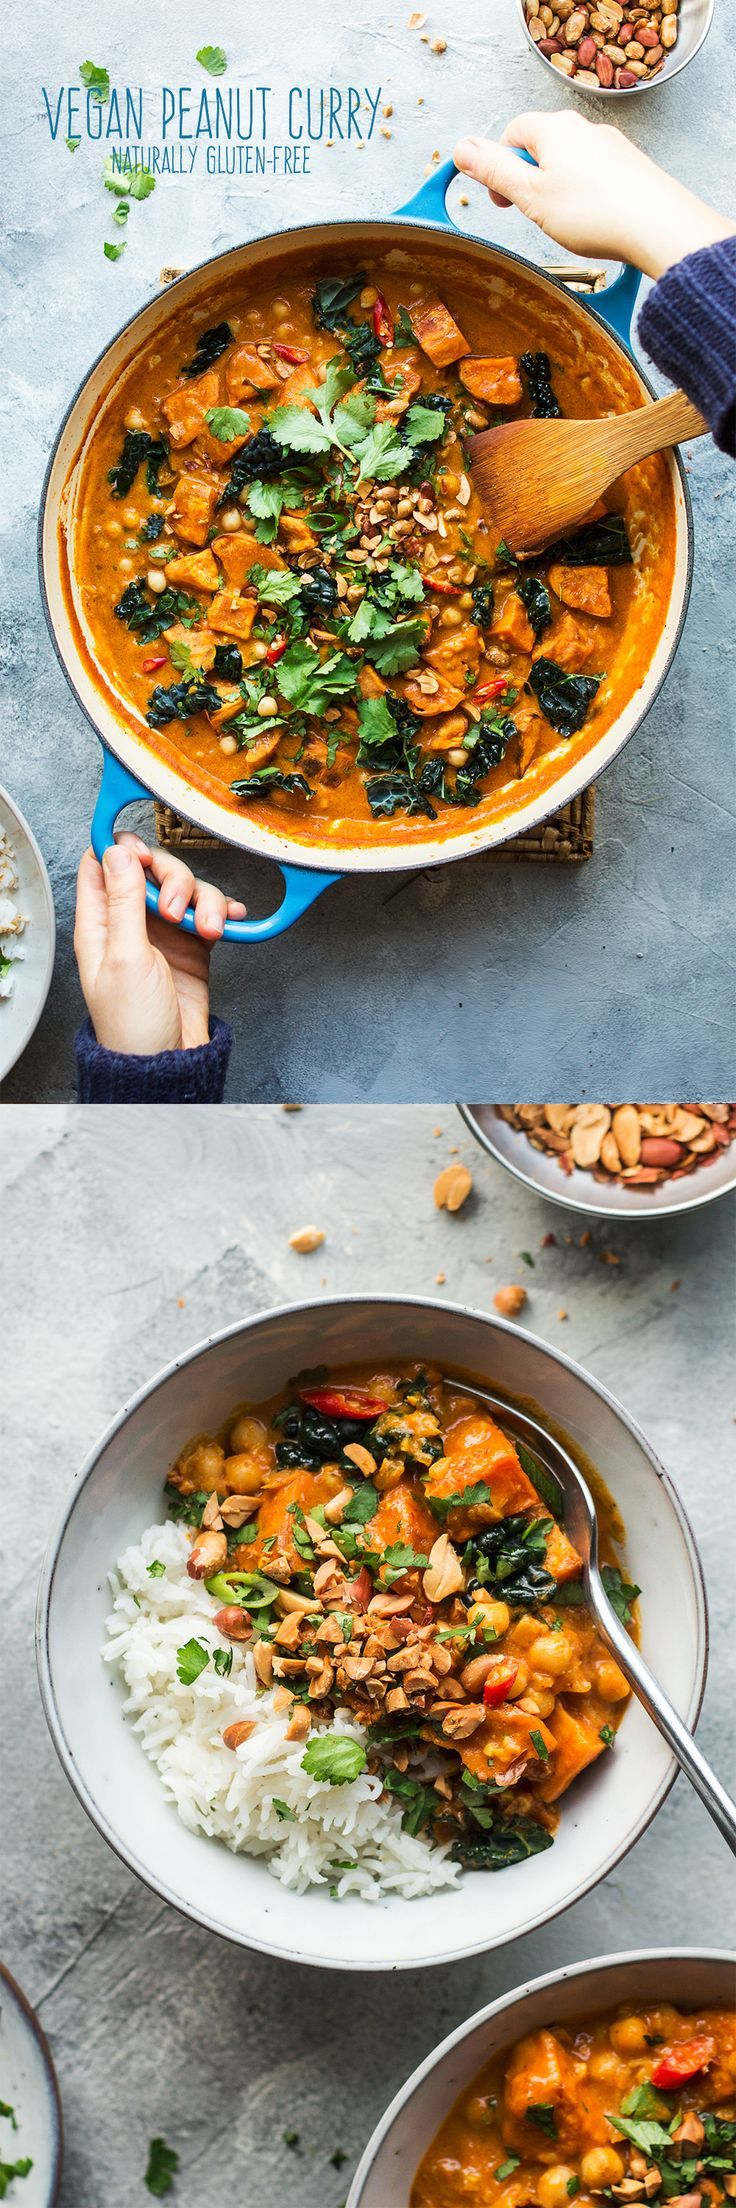 Vegan Peanut Curry With Sweet Potato